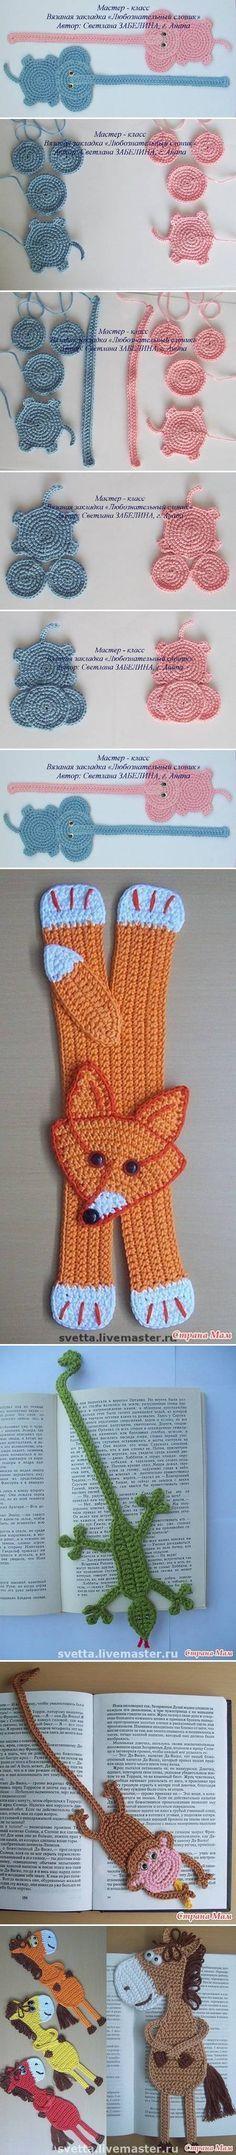 DIY Crochet Repère d'éléphant DIY Crochet Repère d'éléphant